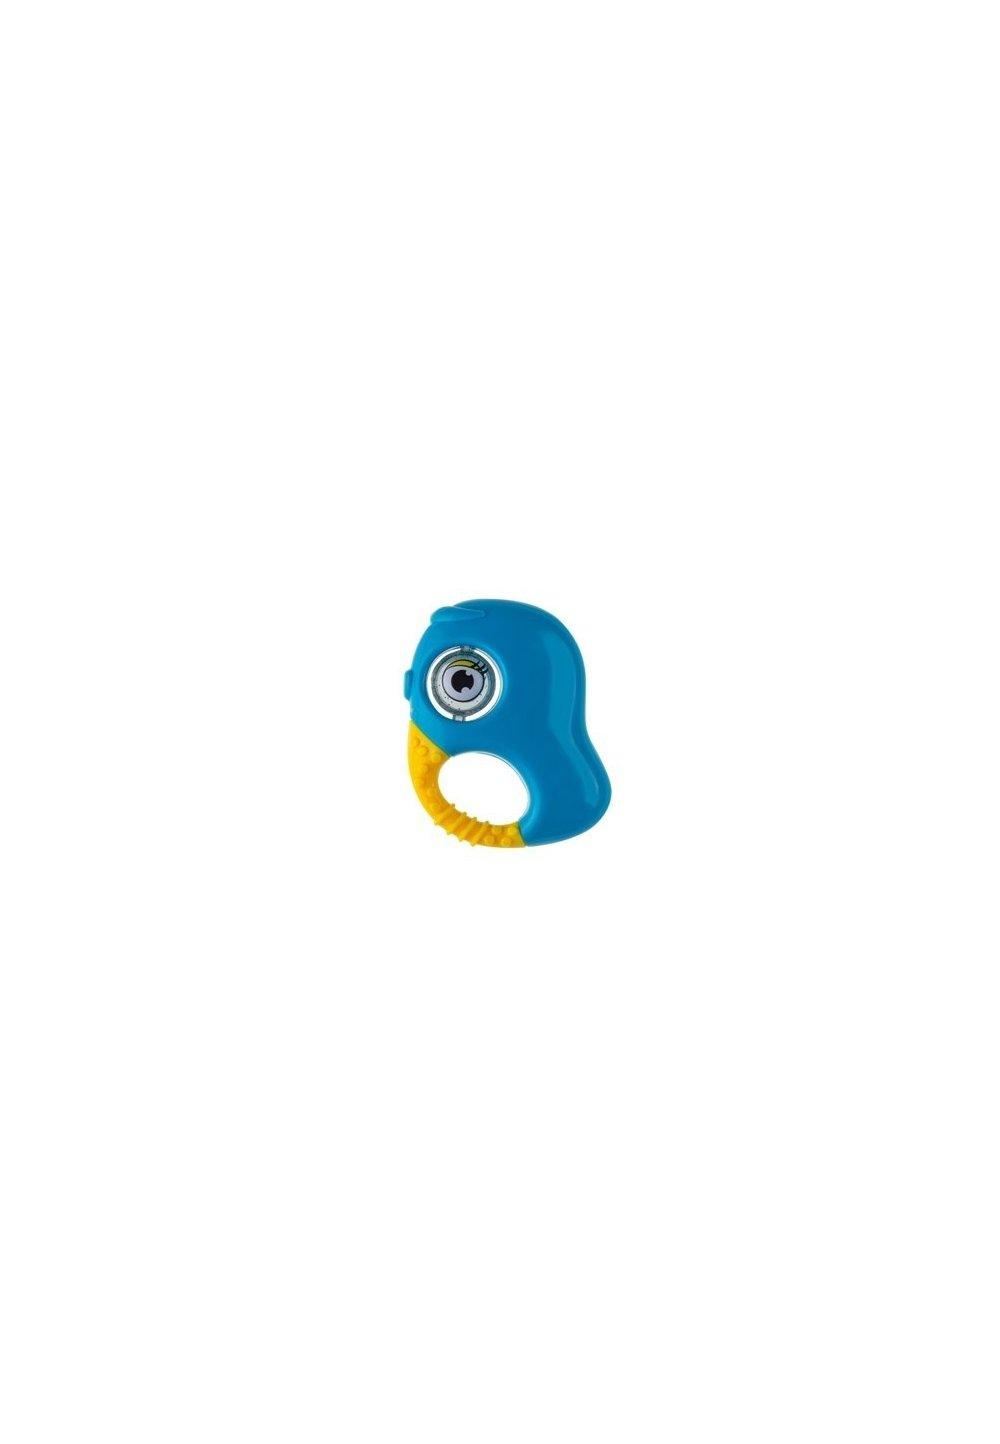 Sunatoare educativa caracatita albastra 1317 imagine